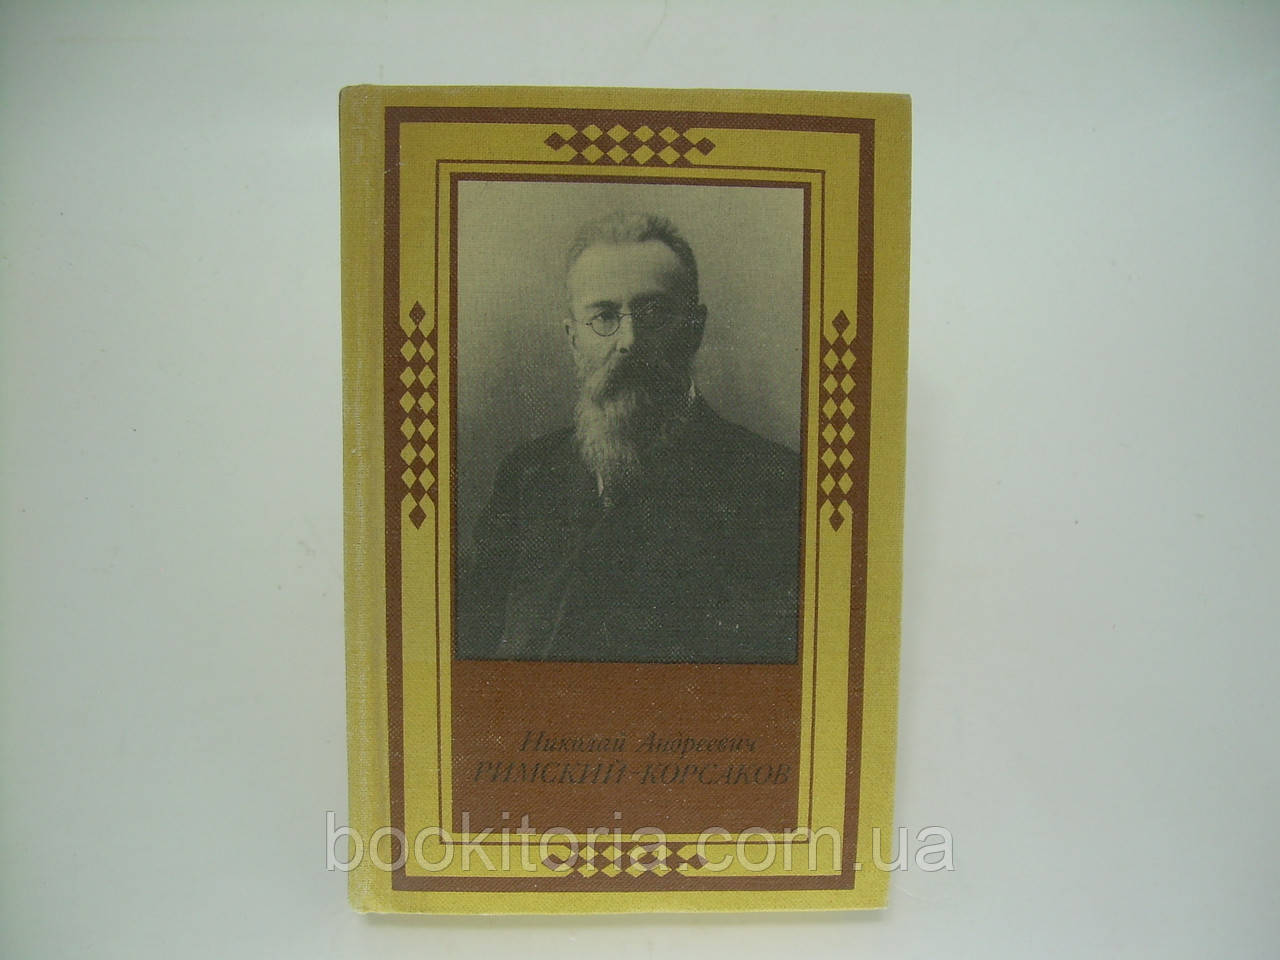 Кунин И.Ф. Николай Андреевич Римский-Корсаков (б/у).